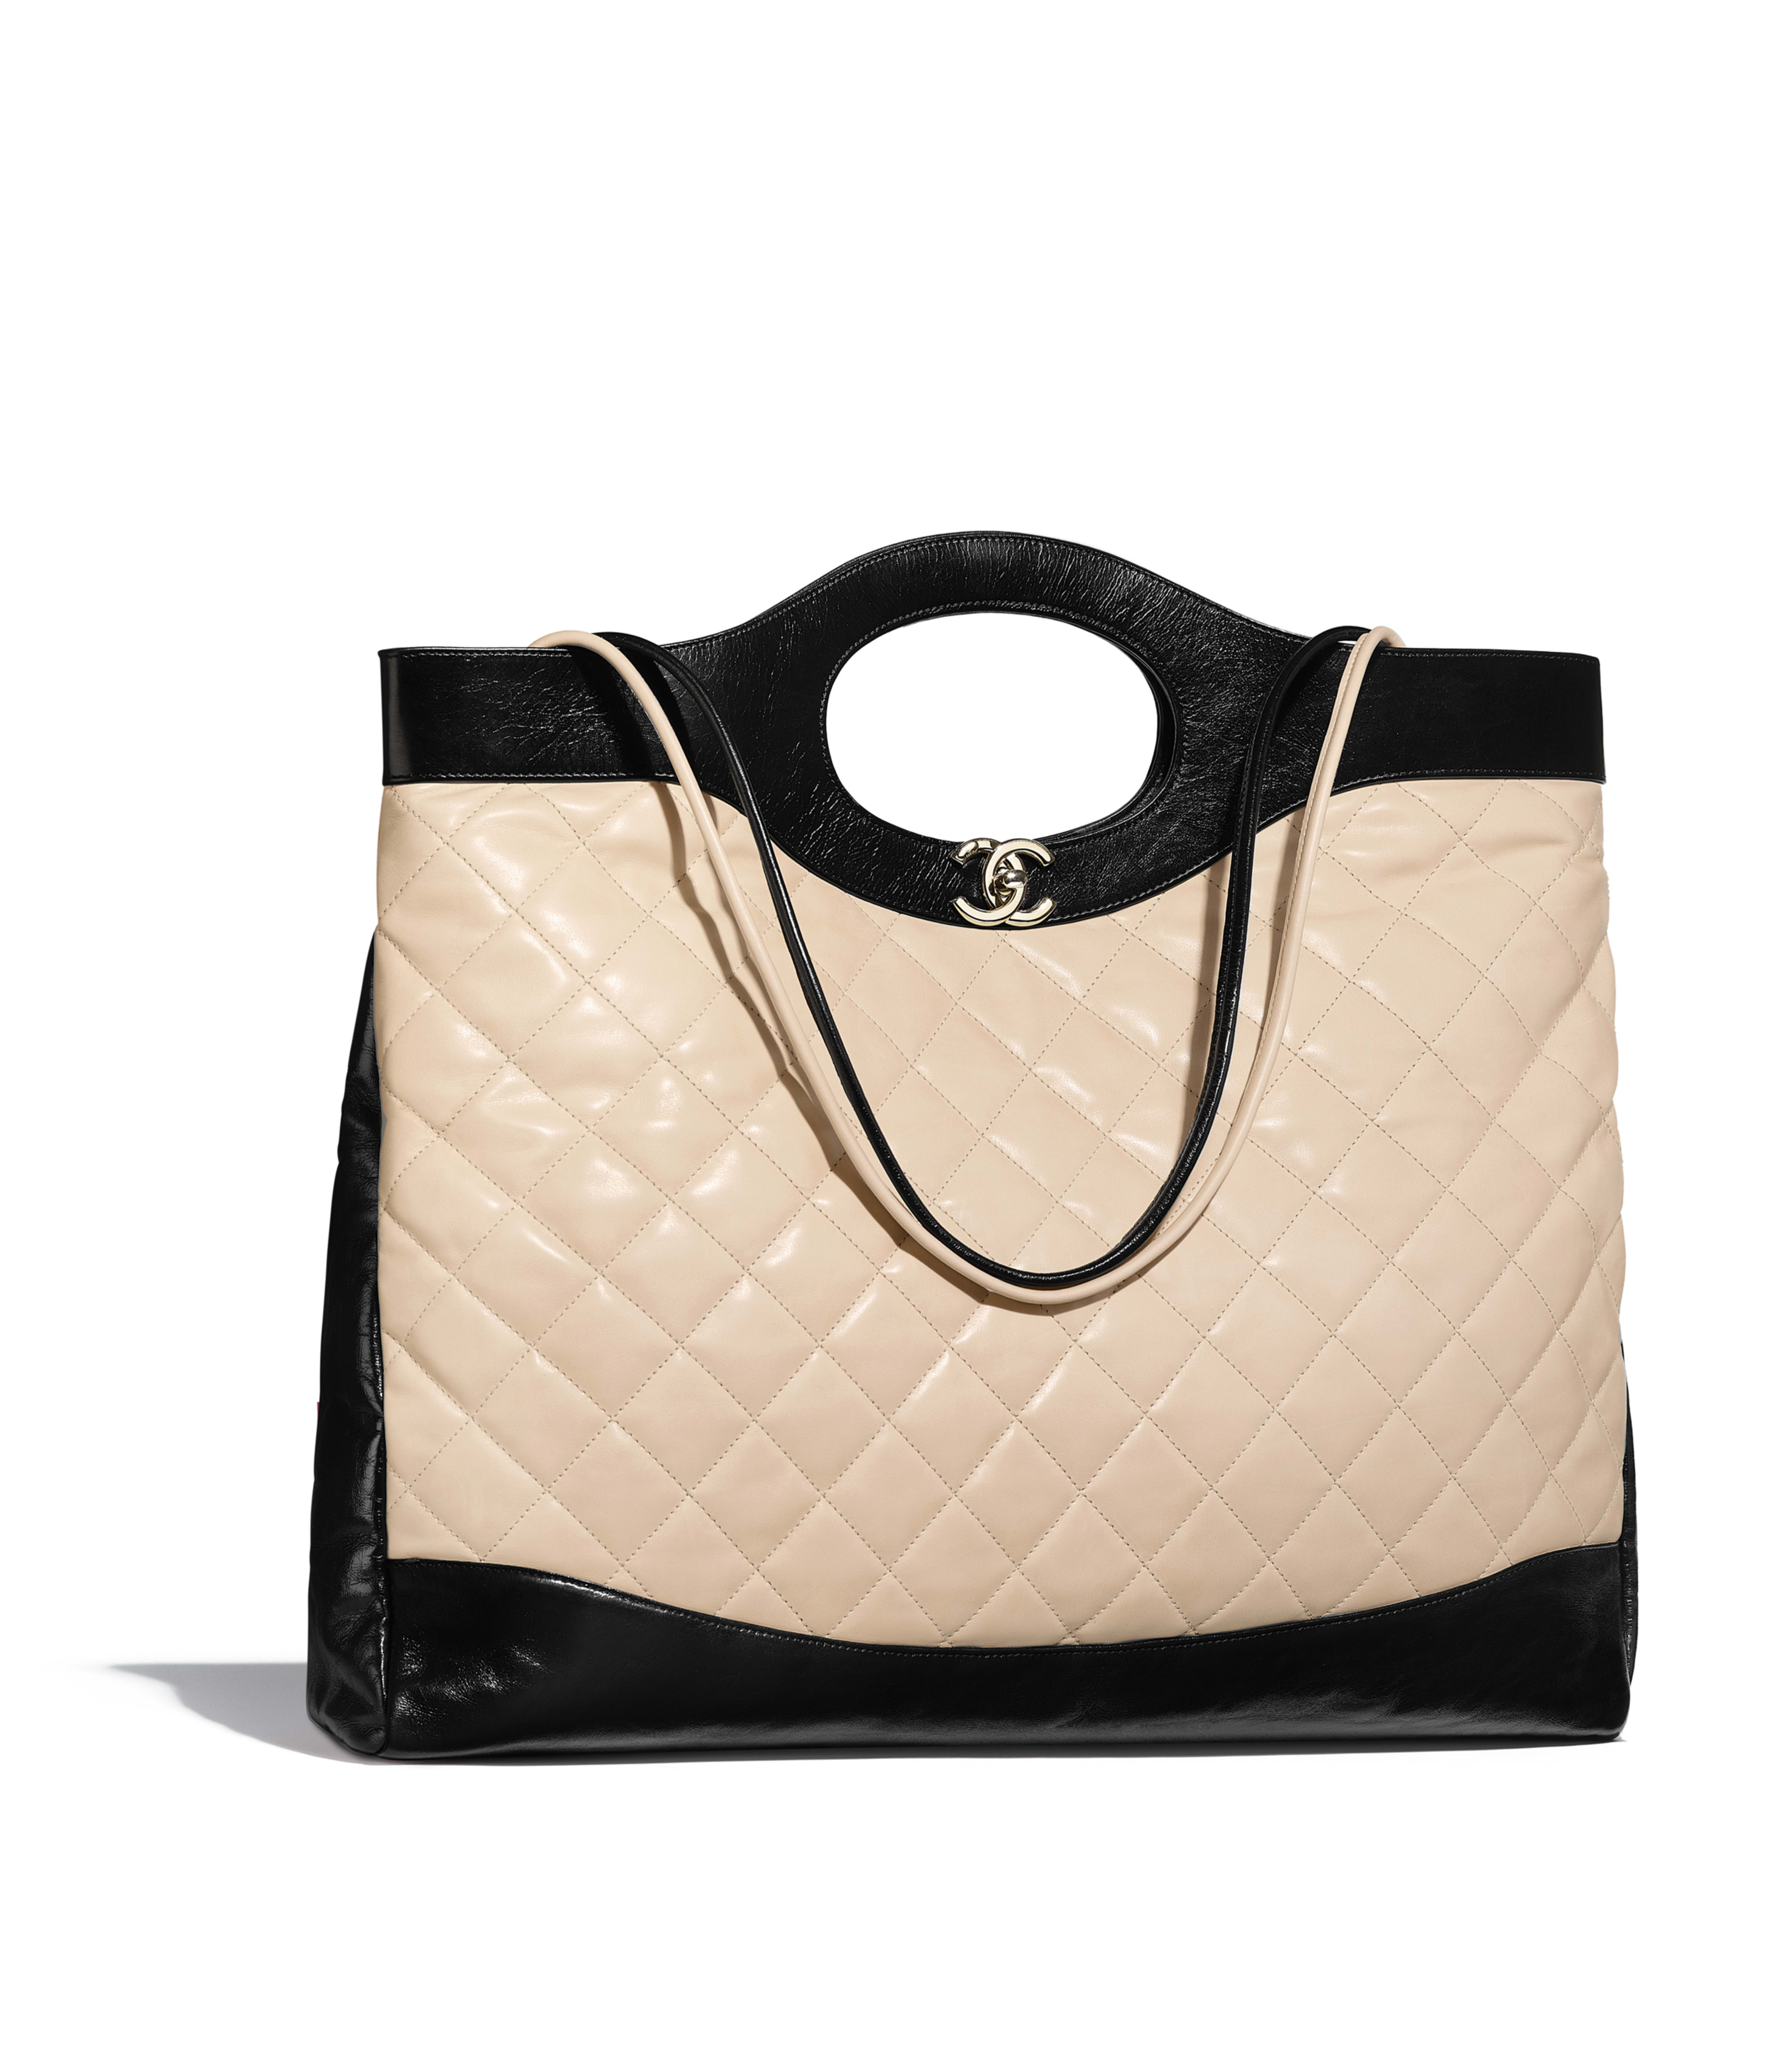 Chanel 31 Large Ping Bag Aged Calfskin Gold Tone Metal Beige Black Ref A57978y84012c1633